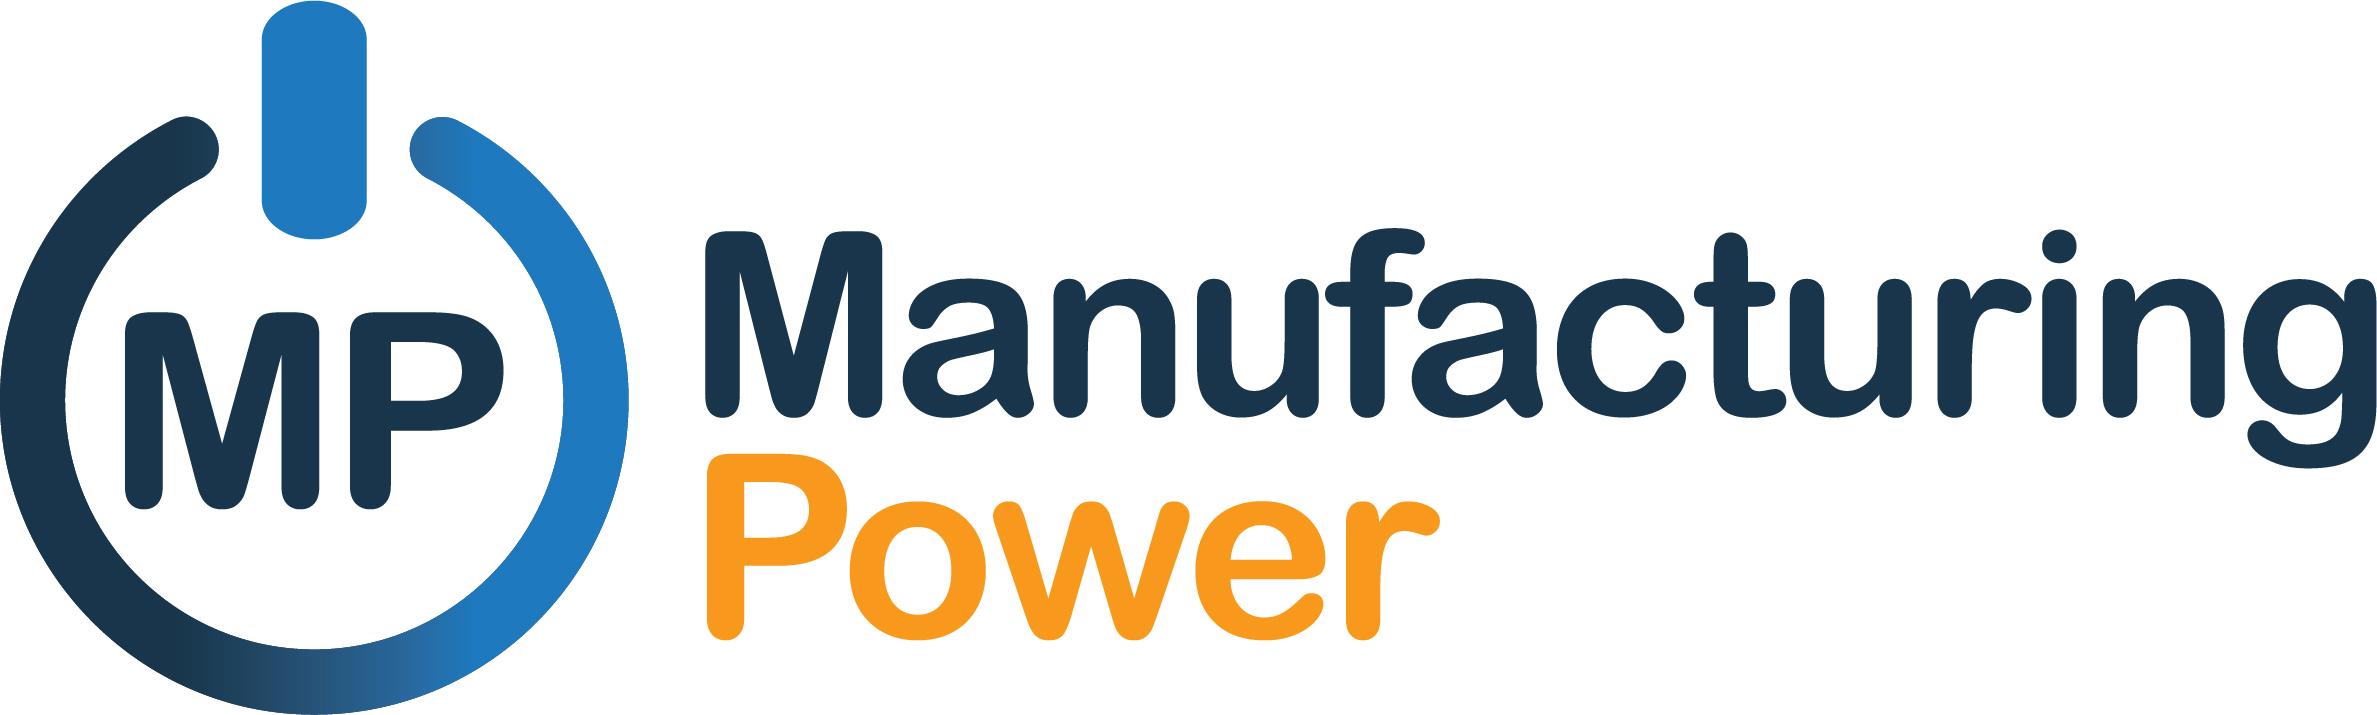 ManufacturingPower Profiled in IoTGlobalNetwork Magazine